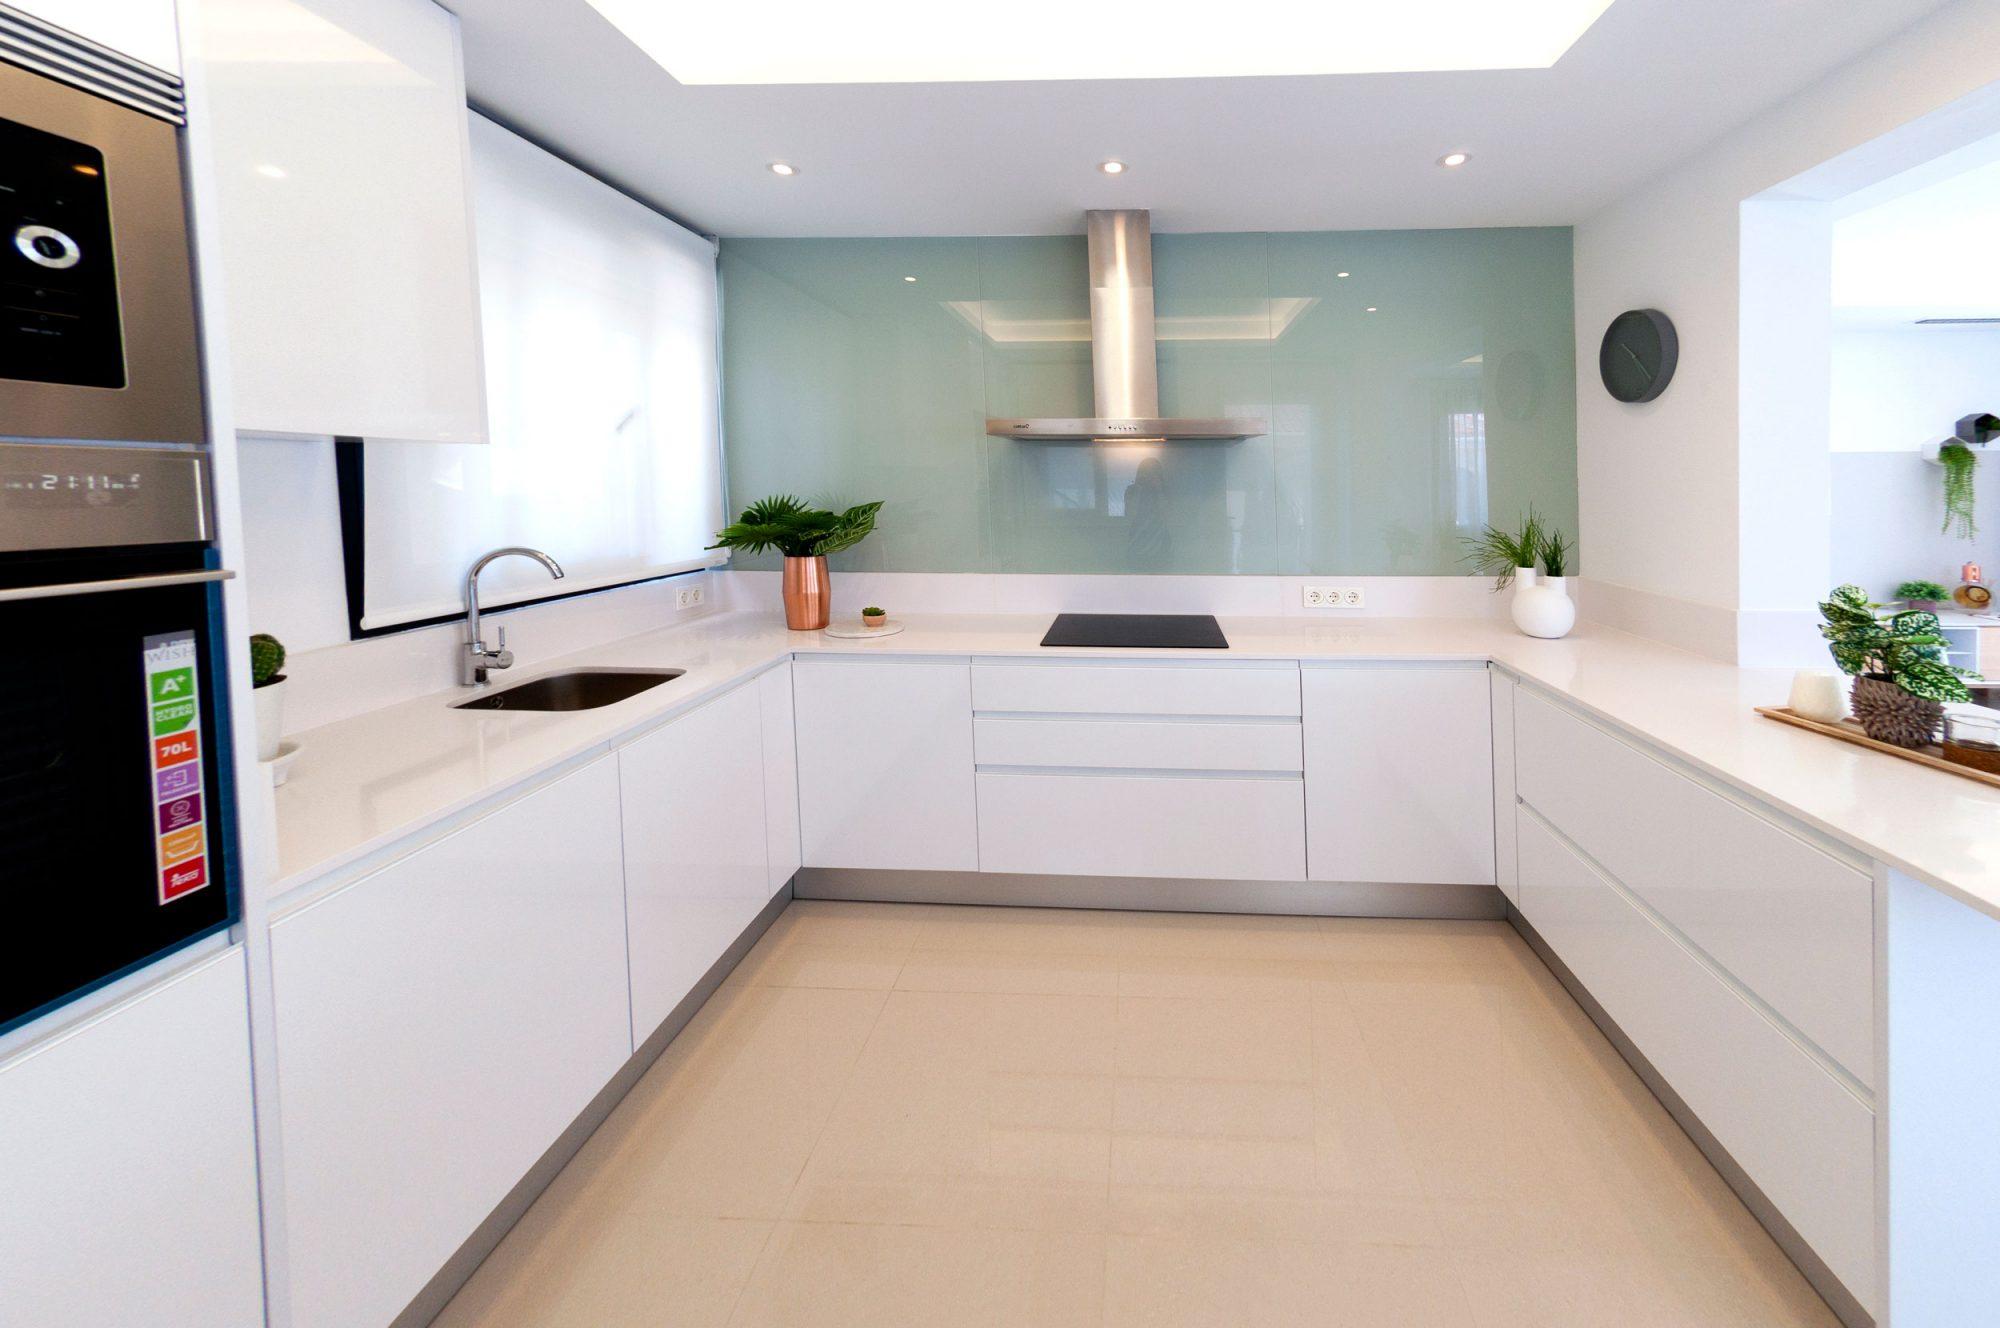 Superbe Villa T5 dans l'urbanisation Monteazul